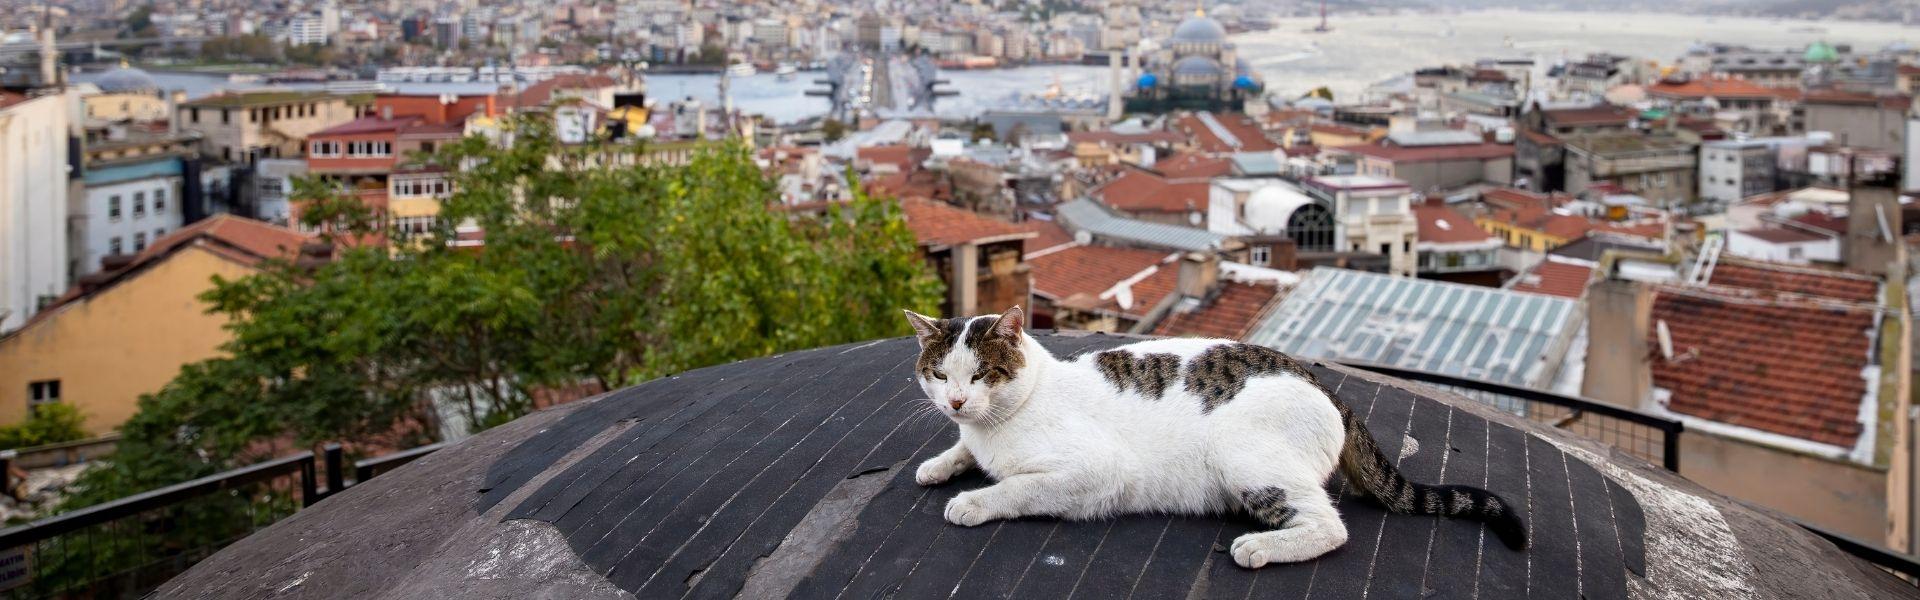 Авторский тур «Крыши Стамбула»